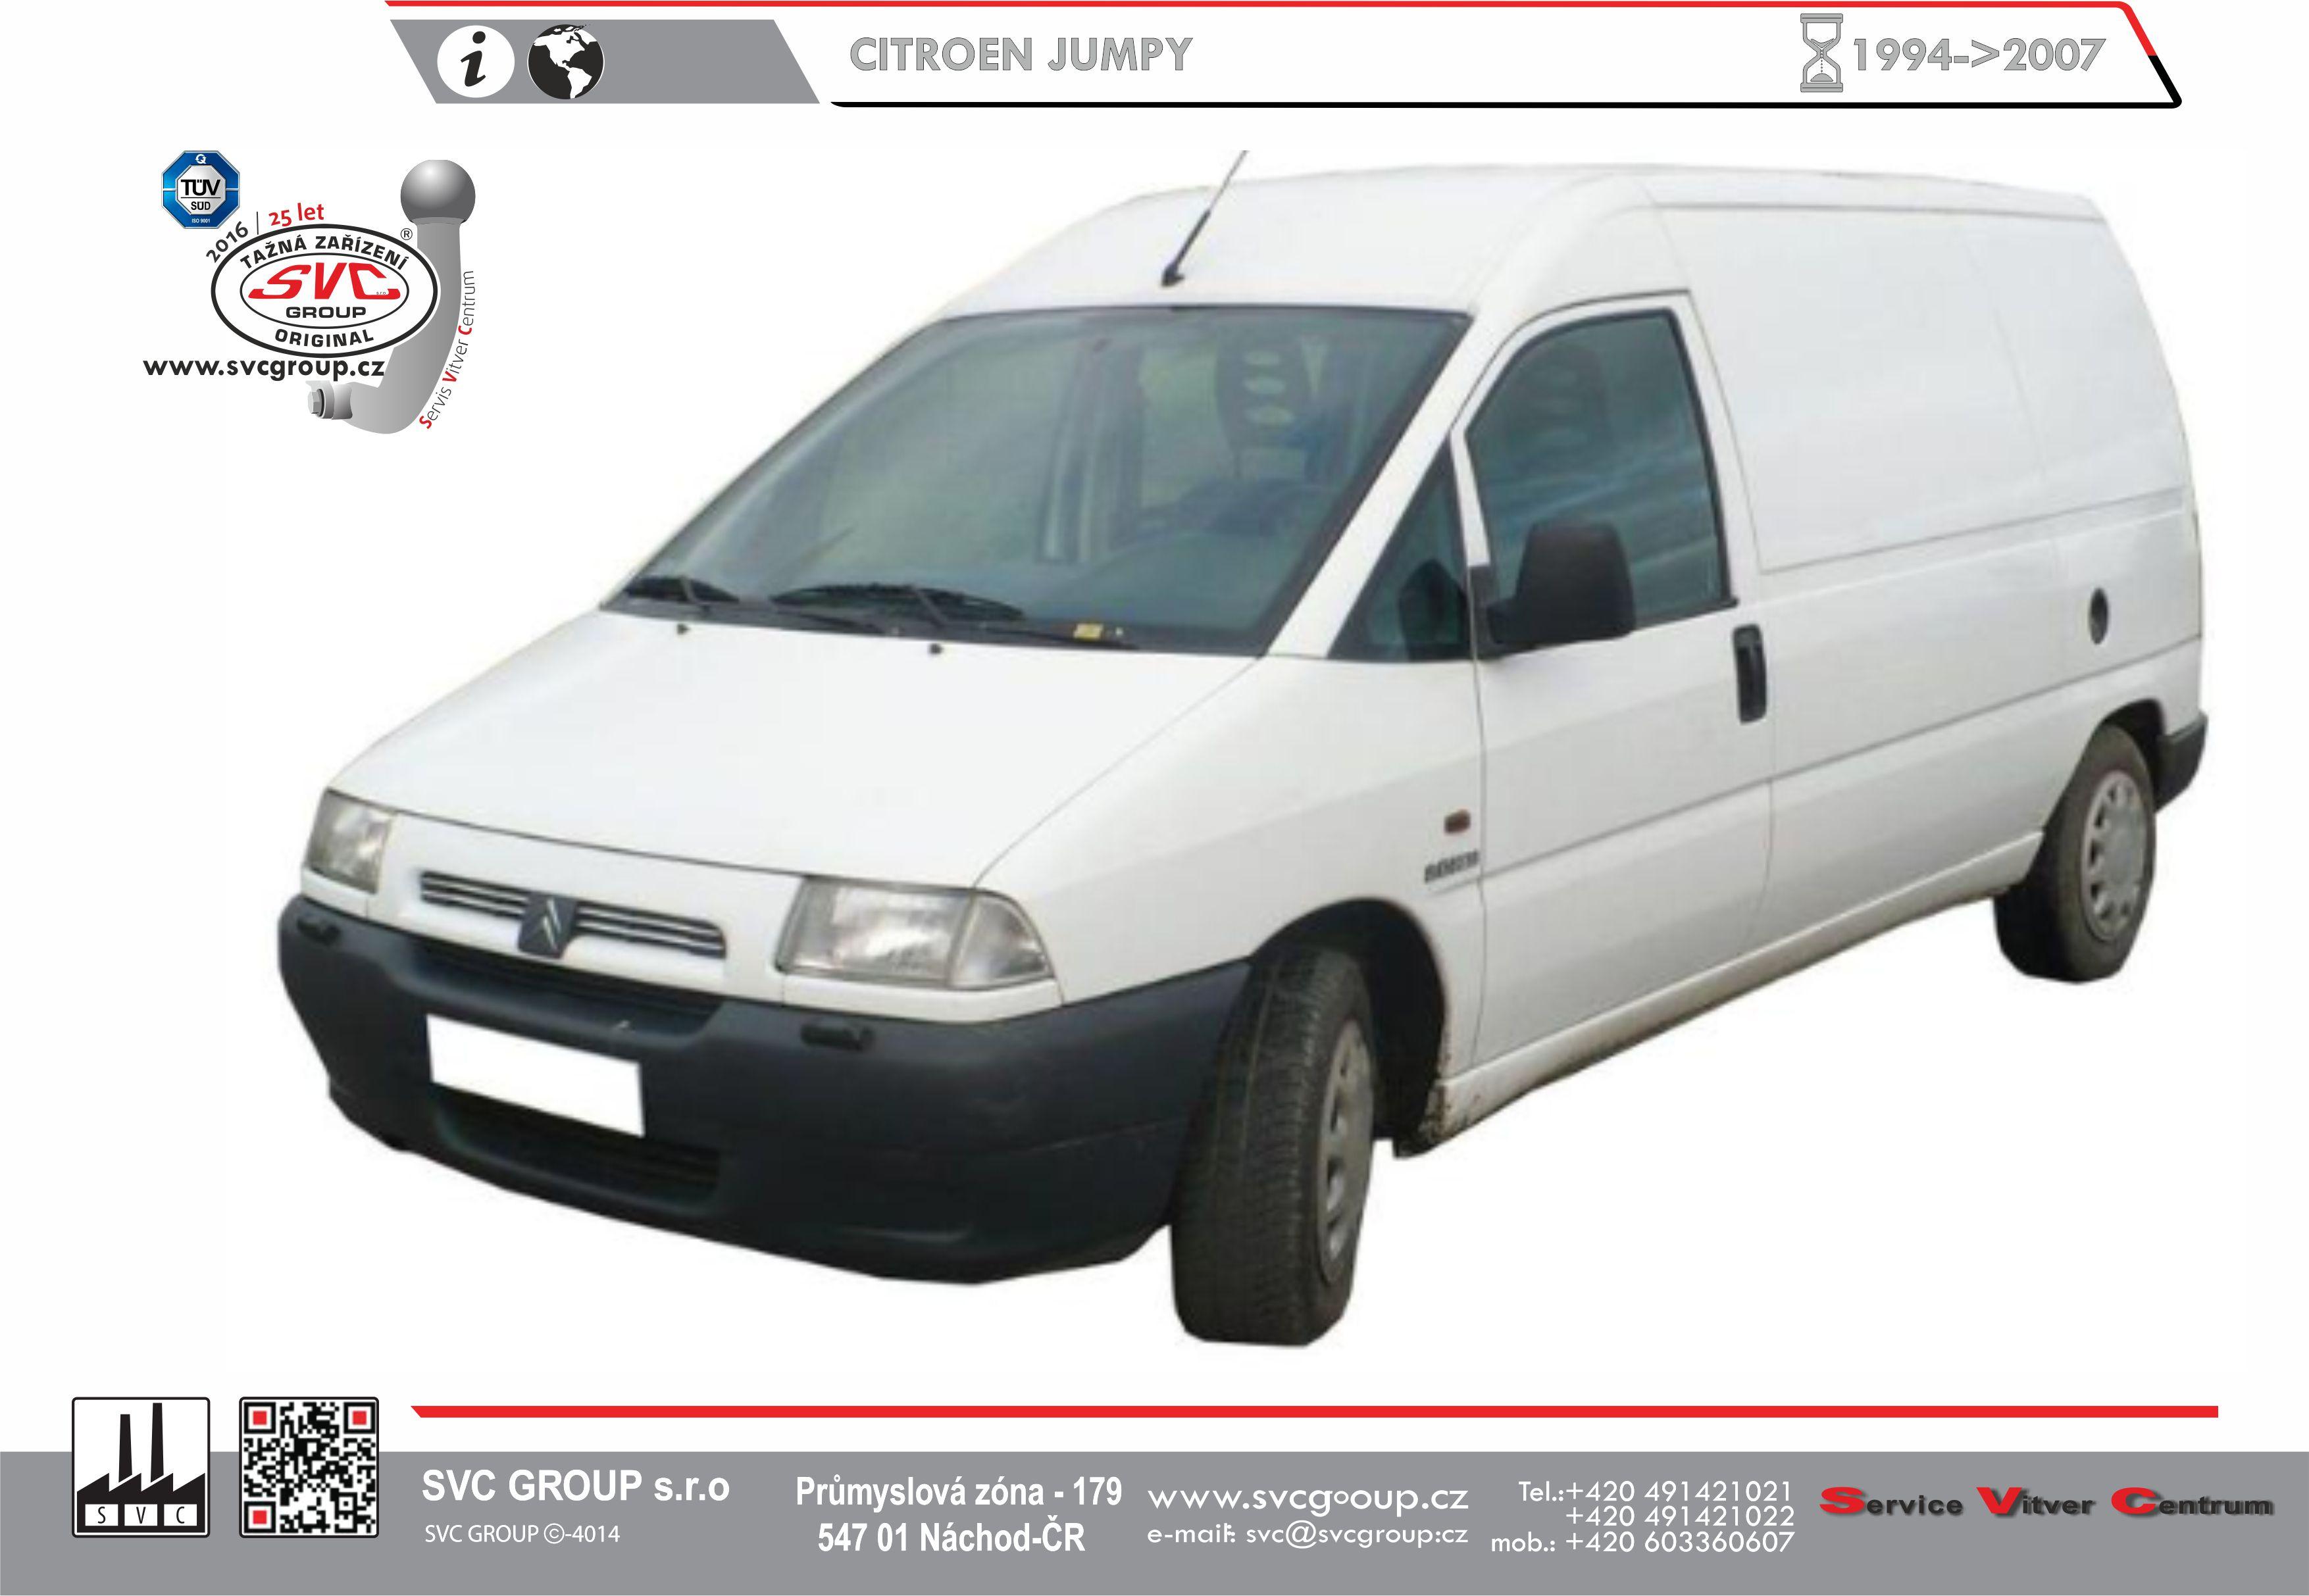 Citroën Jumpy